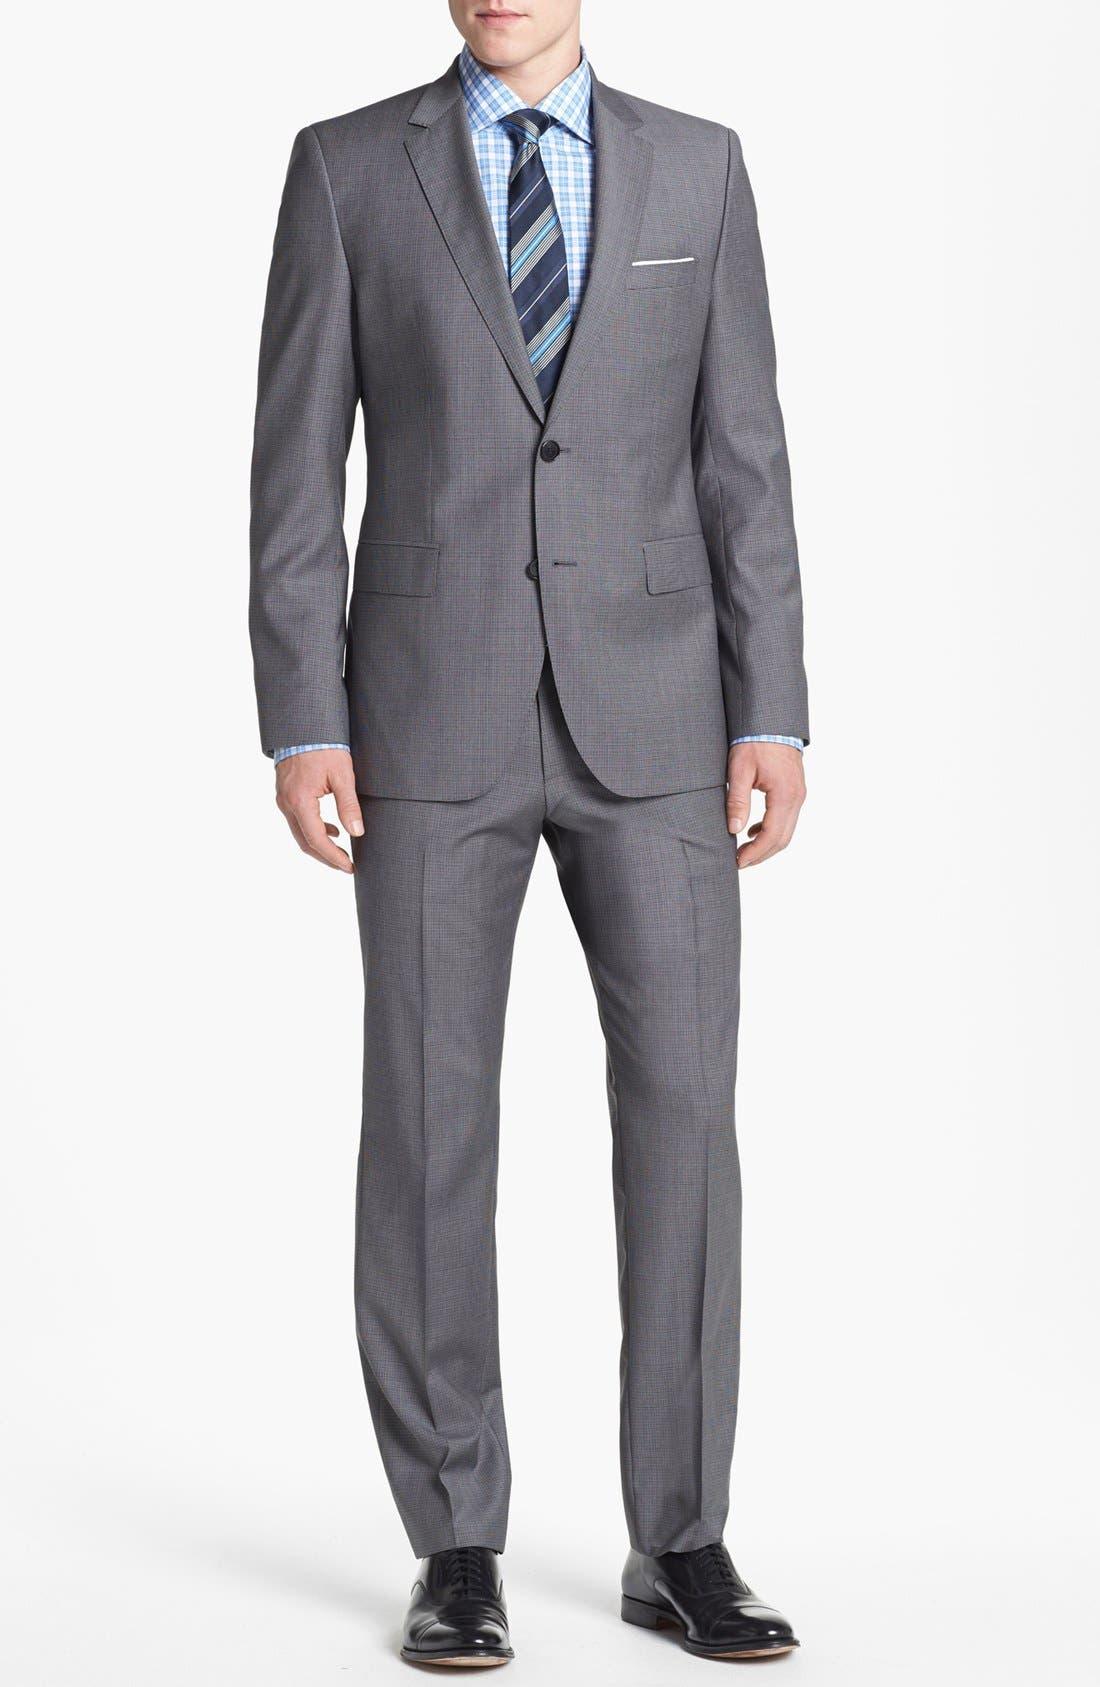 Alternate Image 1 Selected - BOSS HUGO BOSS 'James/Sharp' Trim Fit Houndstooth Suit